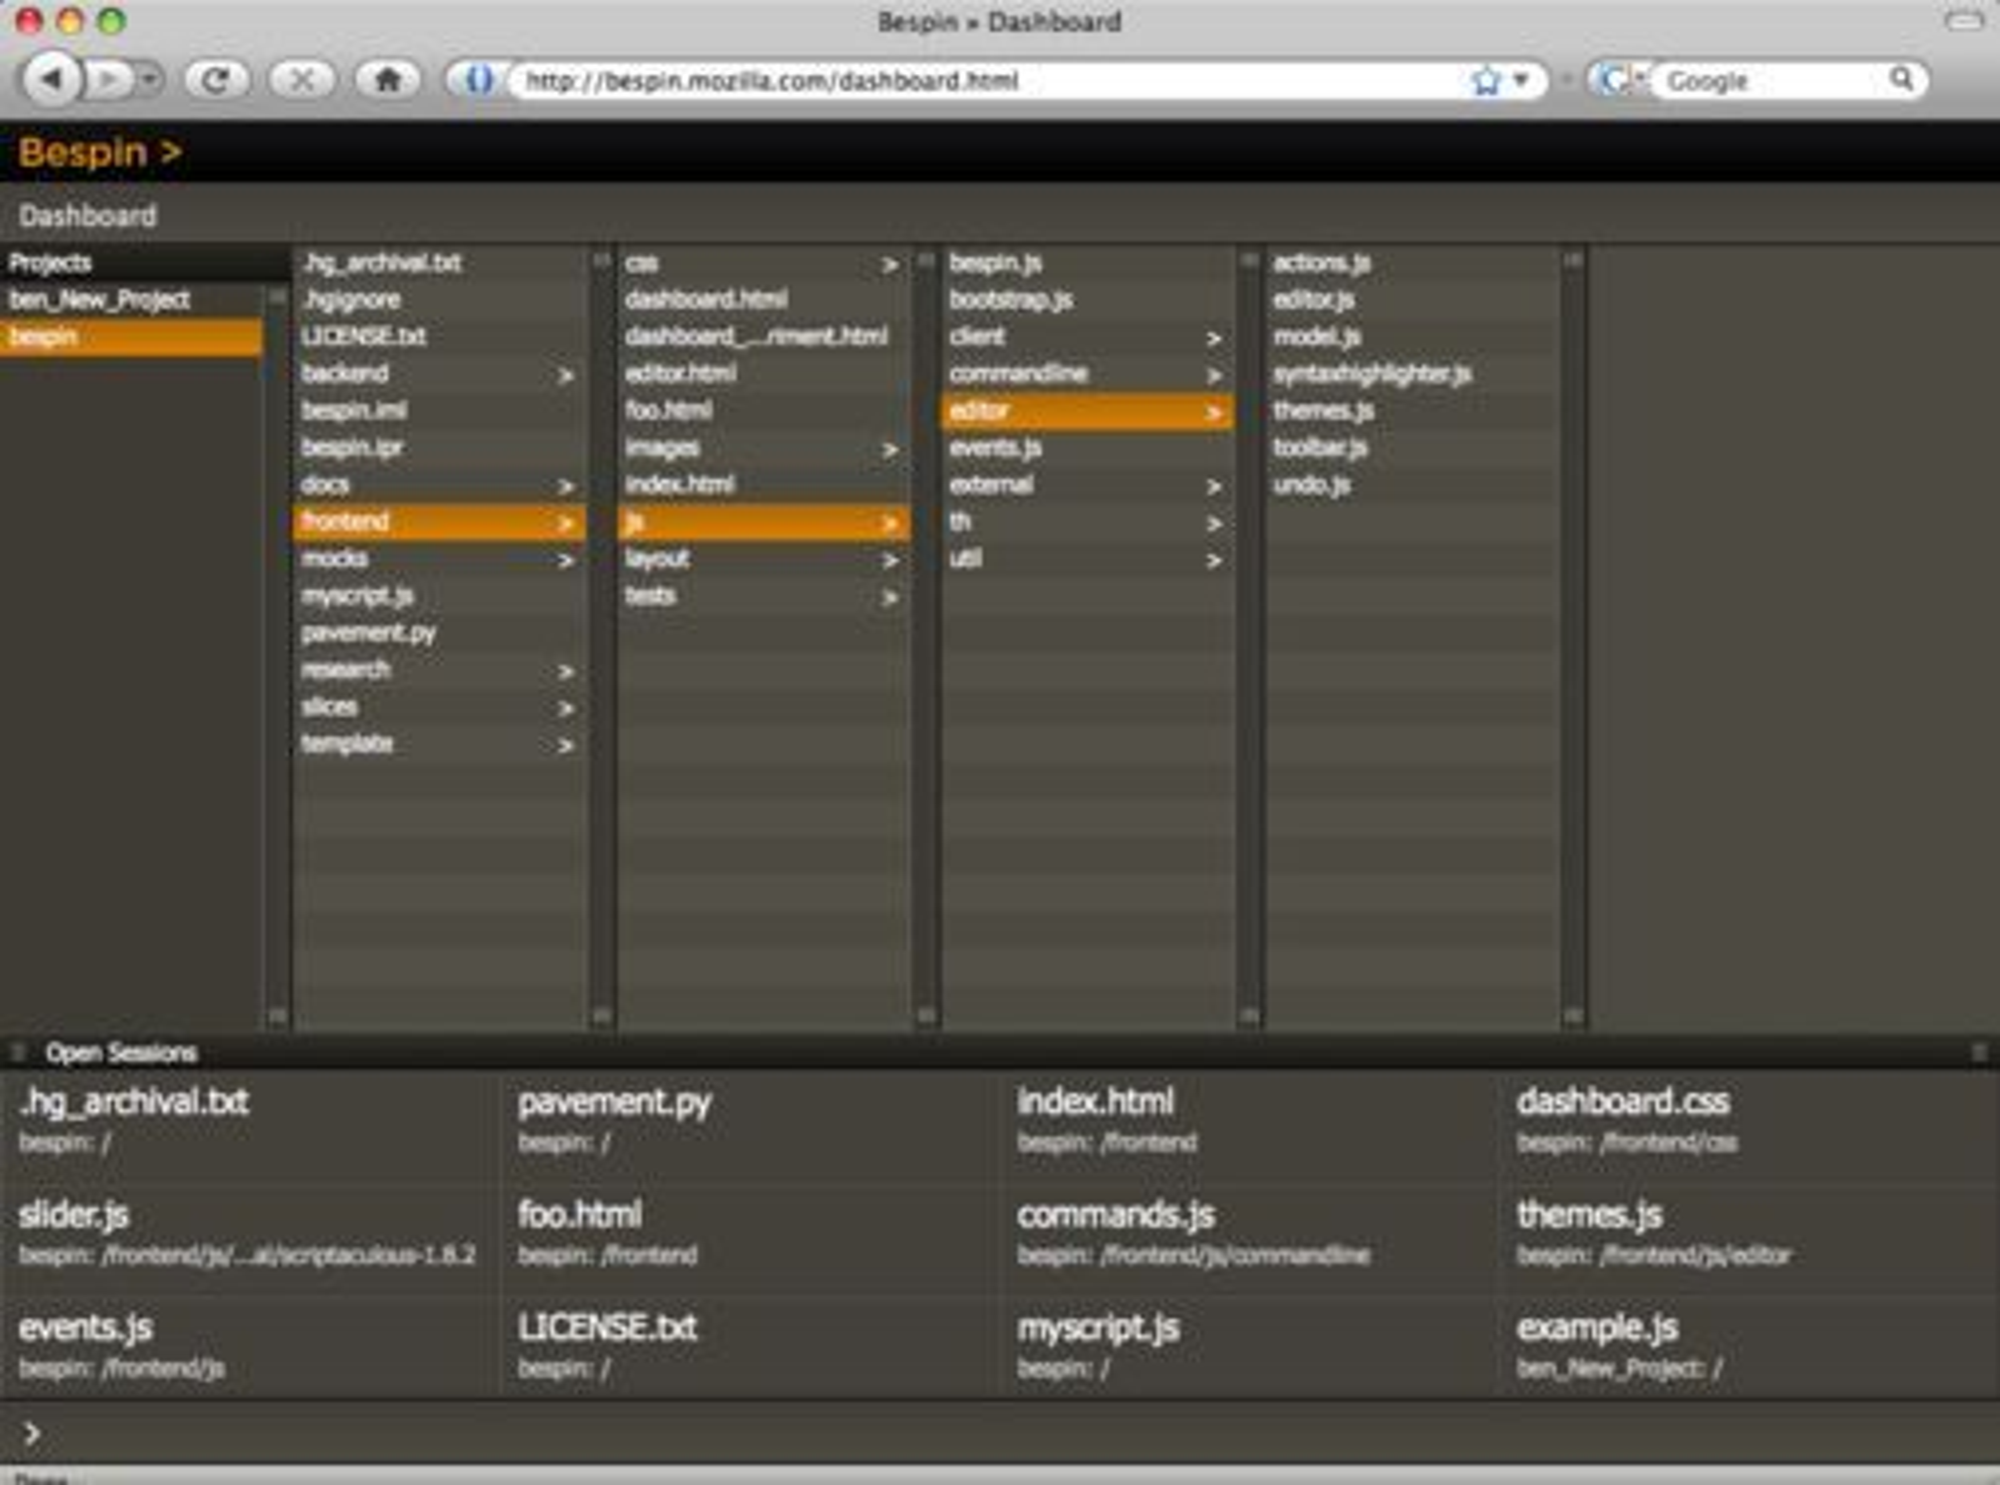 Mozilla Bespin-dashbordet.